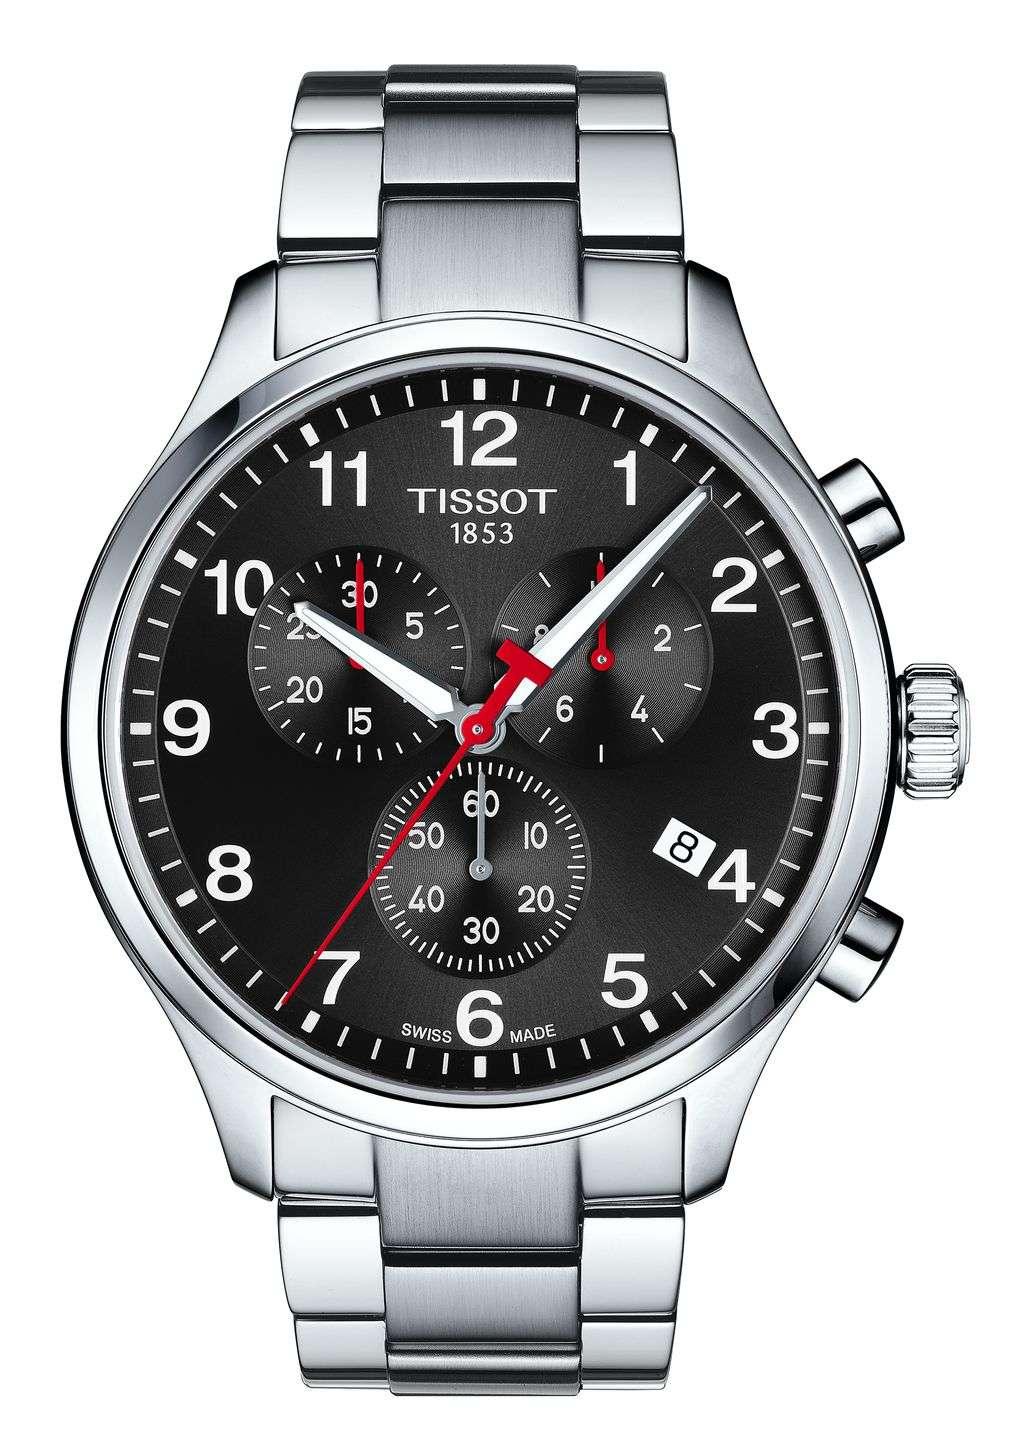 Tissot Chrono XL Classic韻馳系列腕錶2018亞運限定款